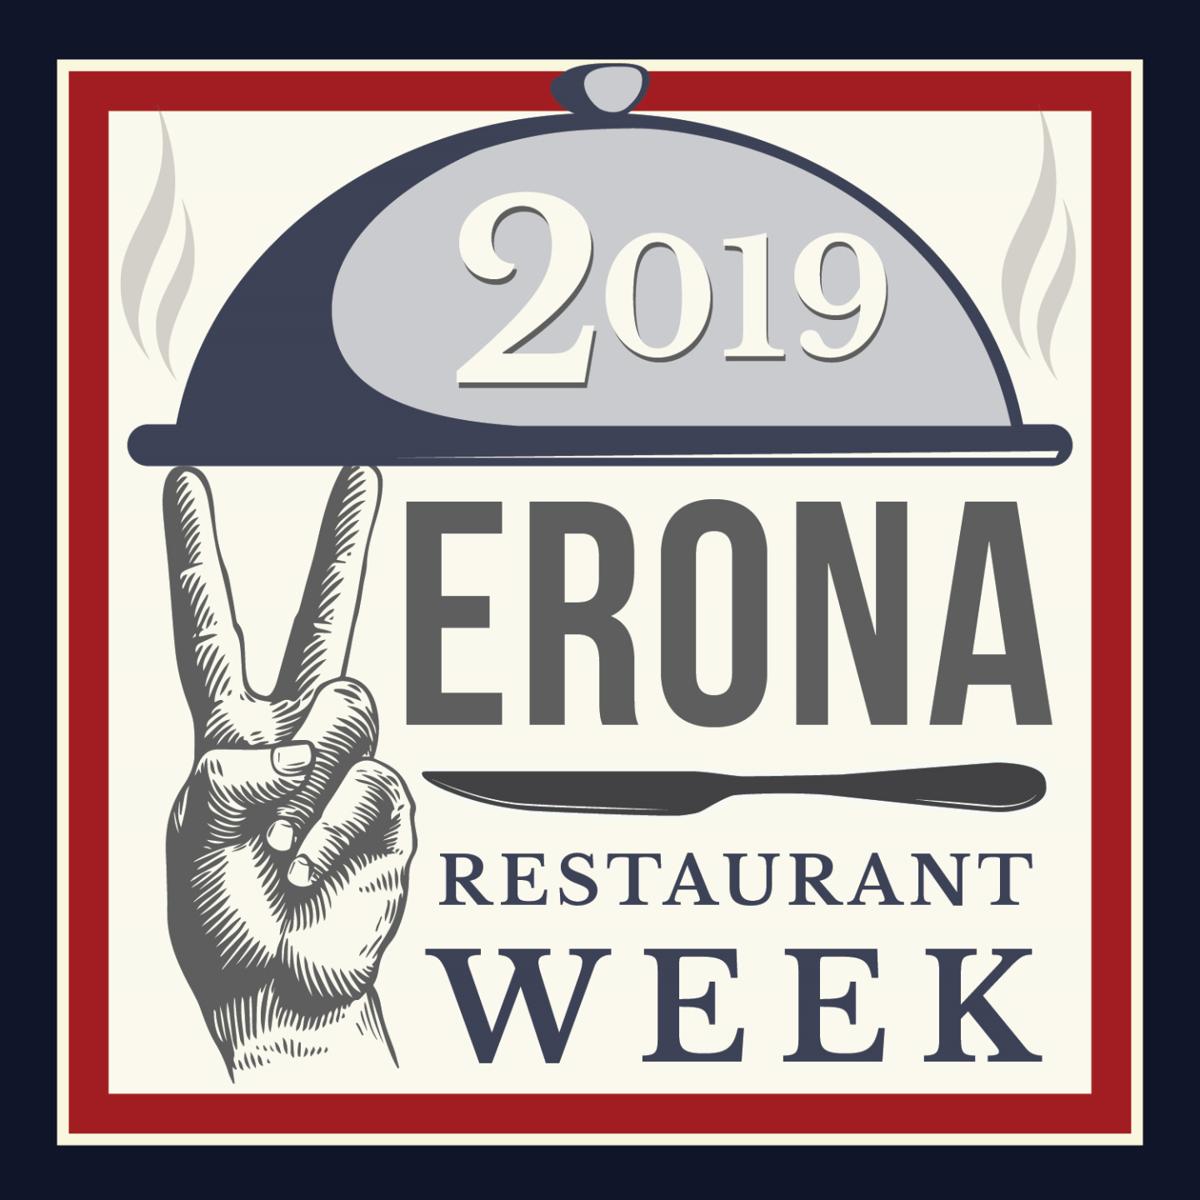 2019 Verona Restaurant week